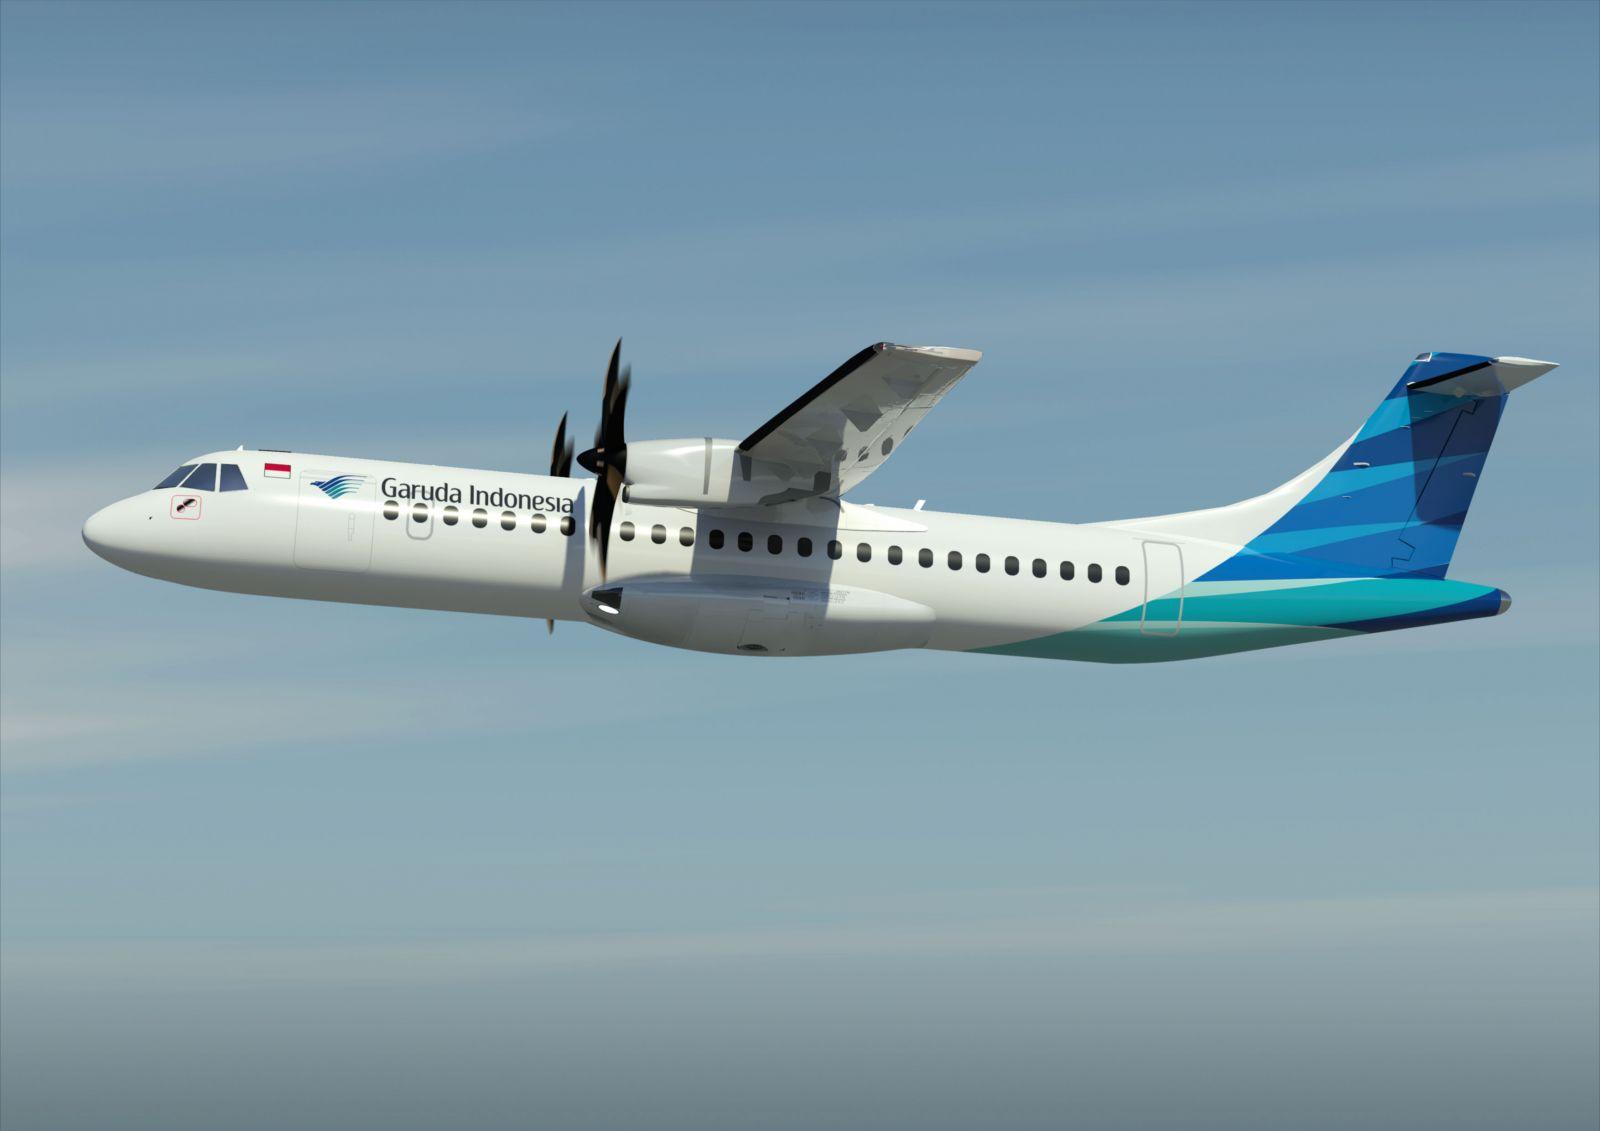 Garuda selects ATR